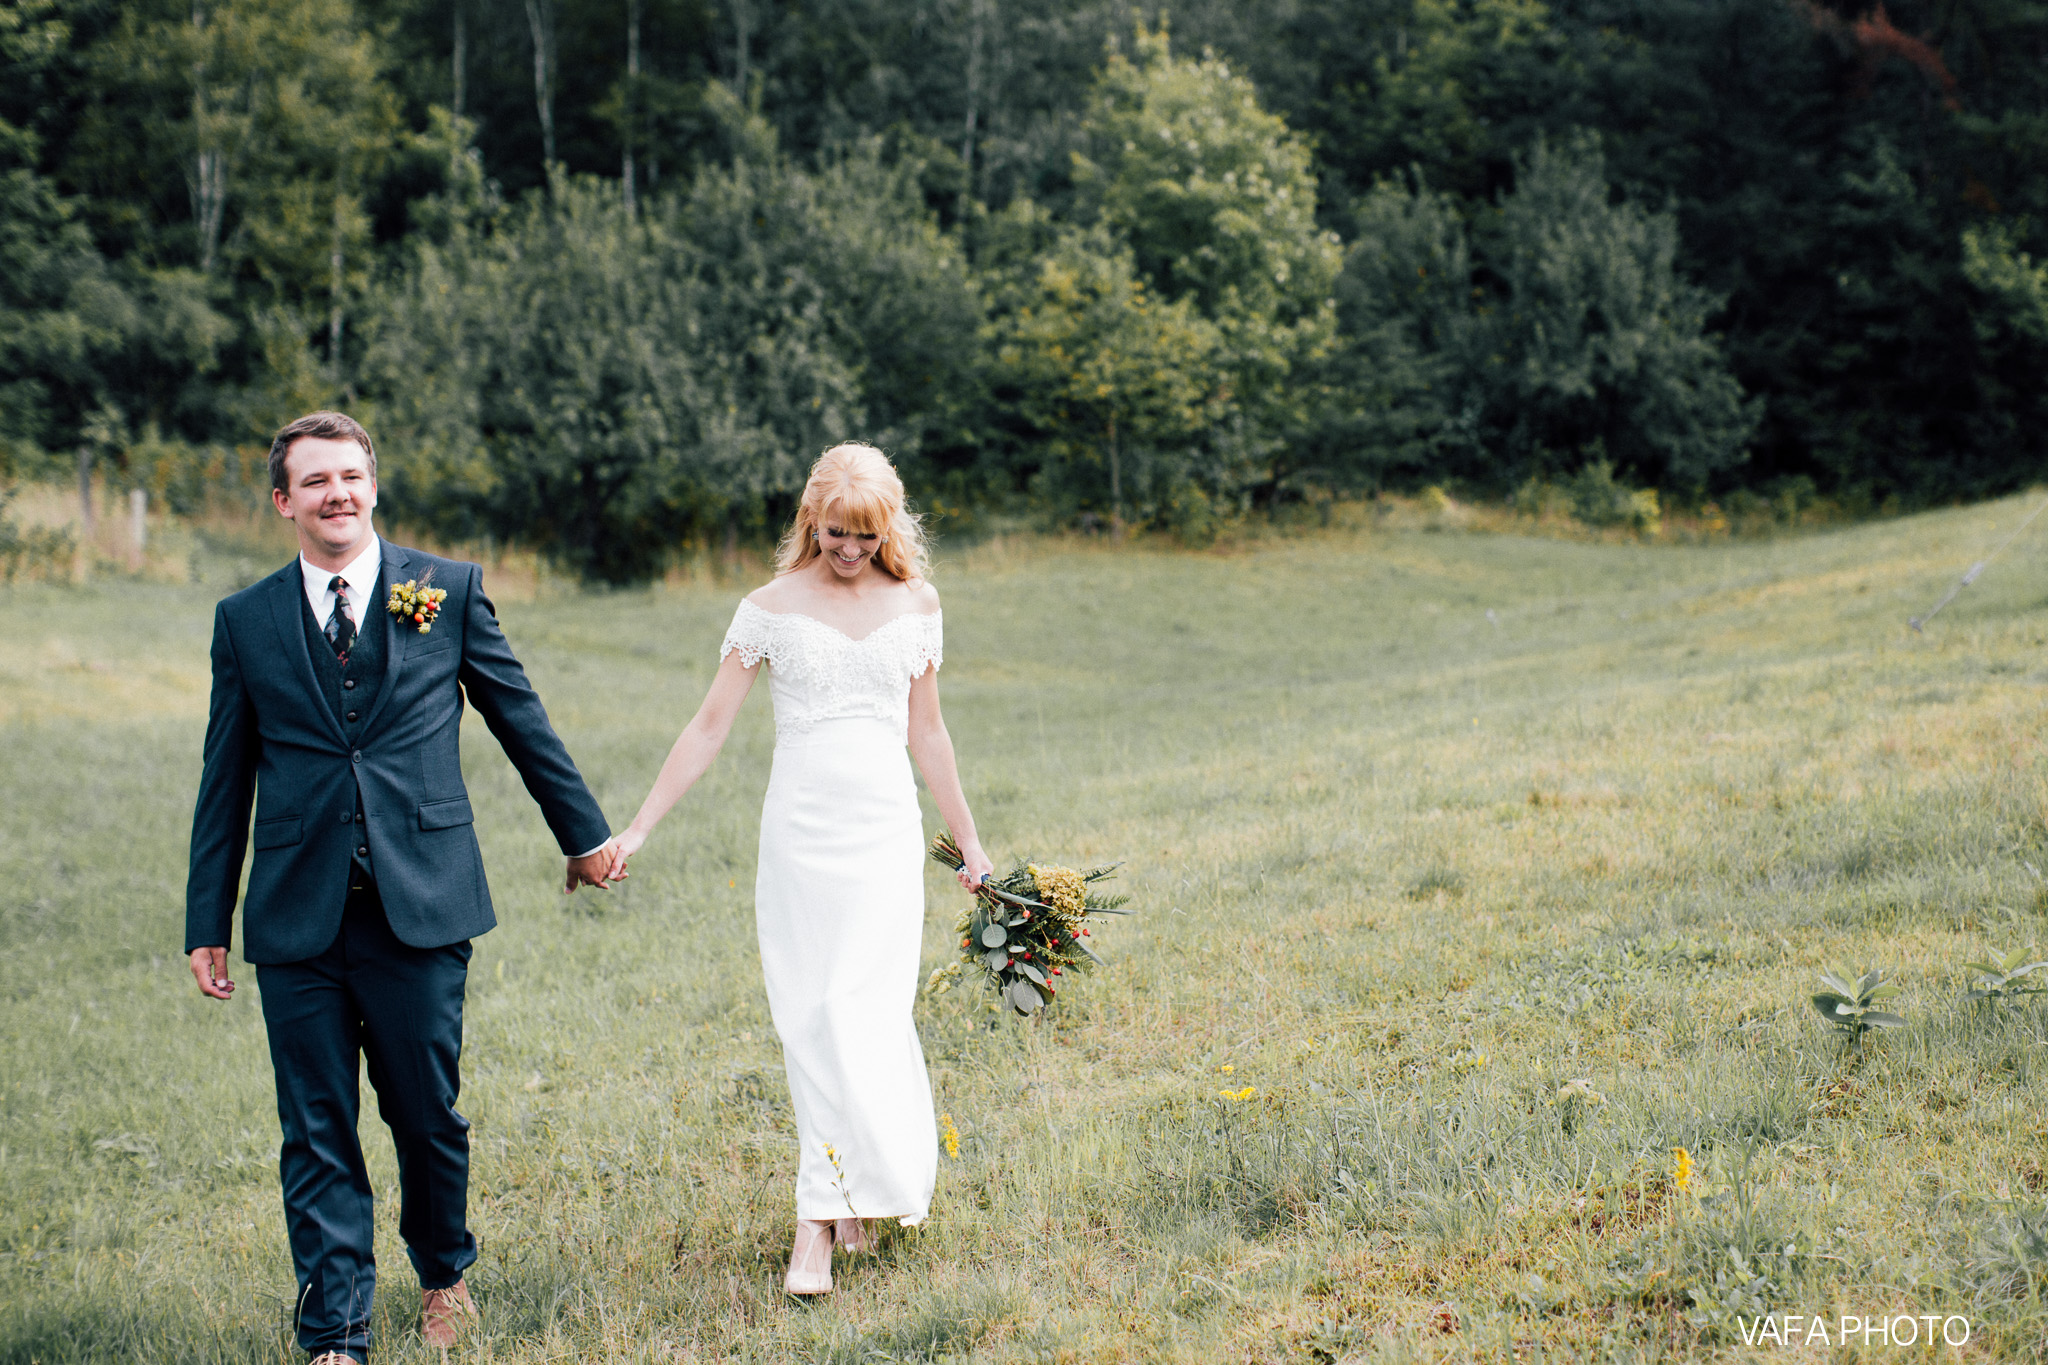 Belsolda-Farm-Wedding-Christy-Eric-Vafa-Photo-162.jpg